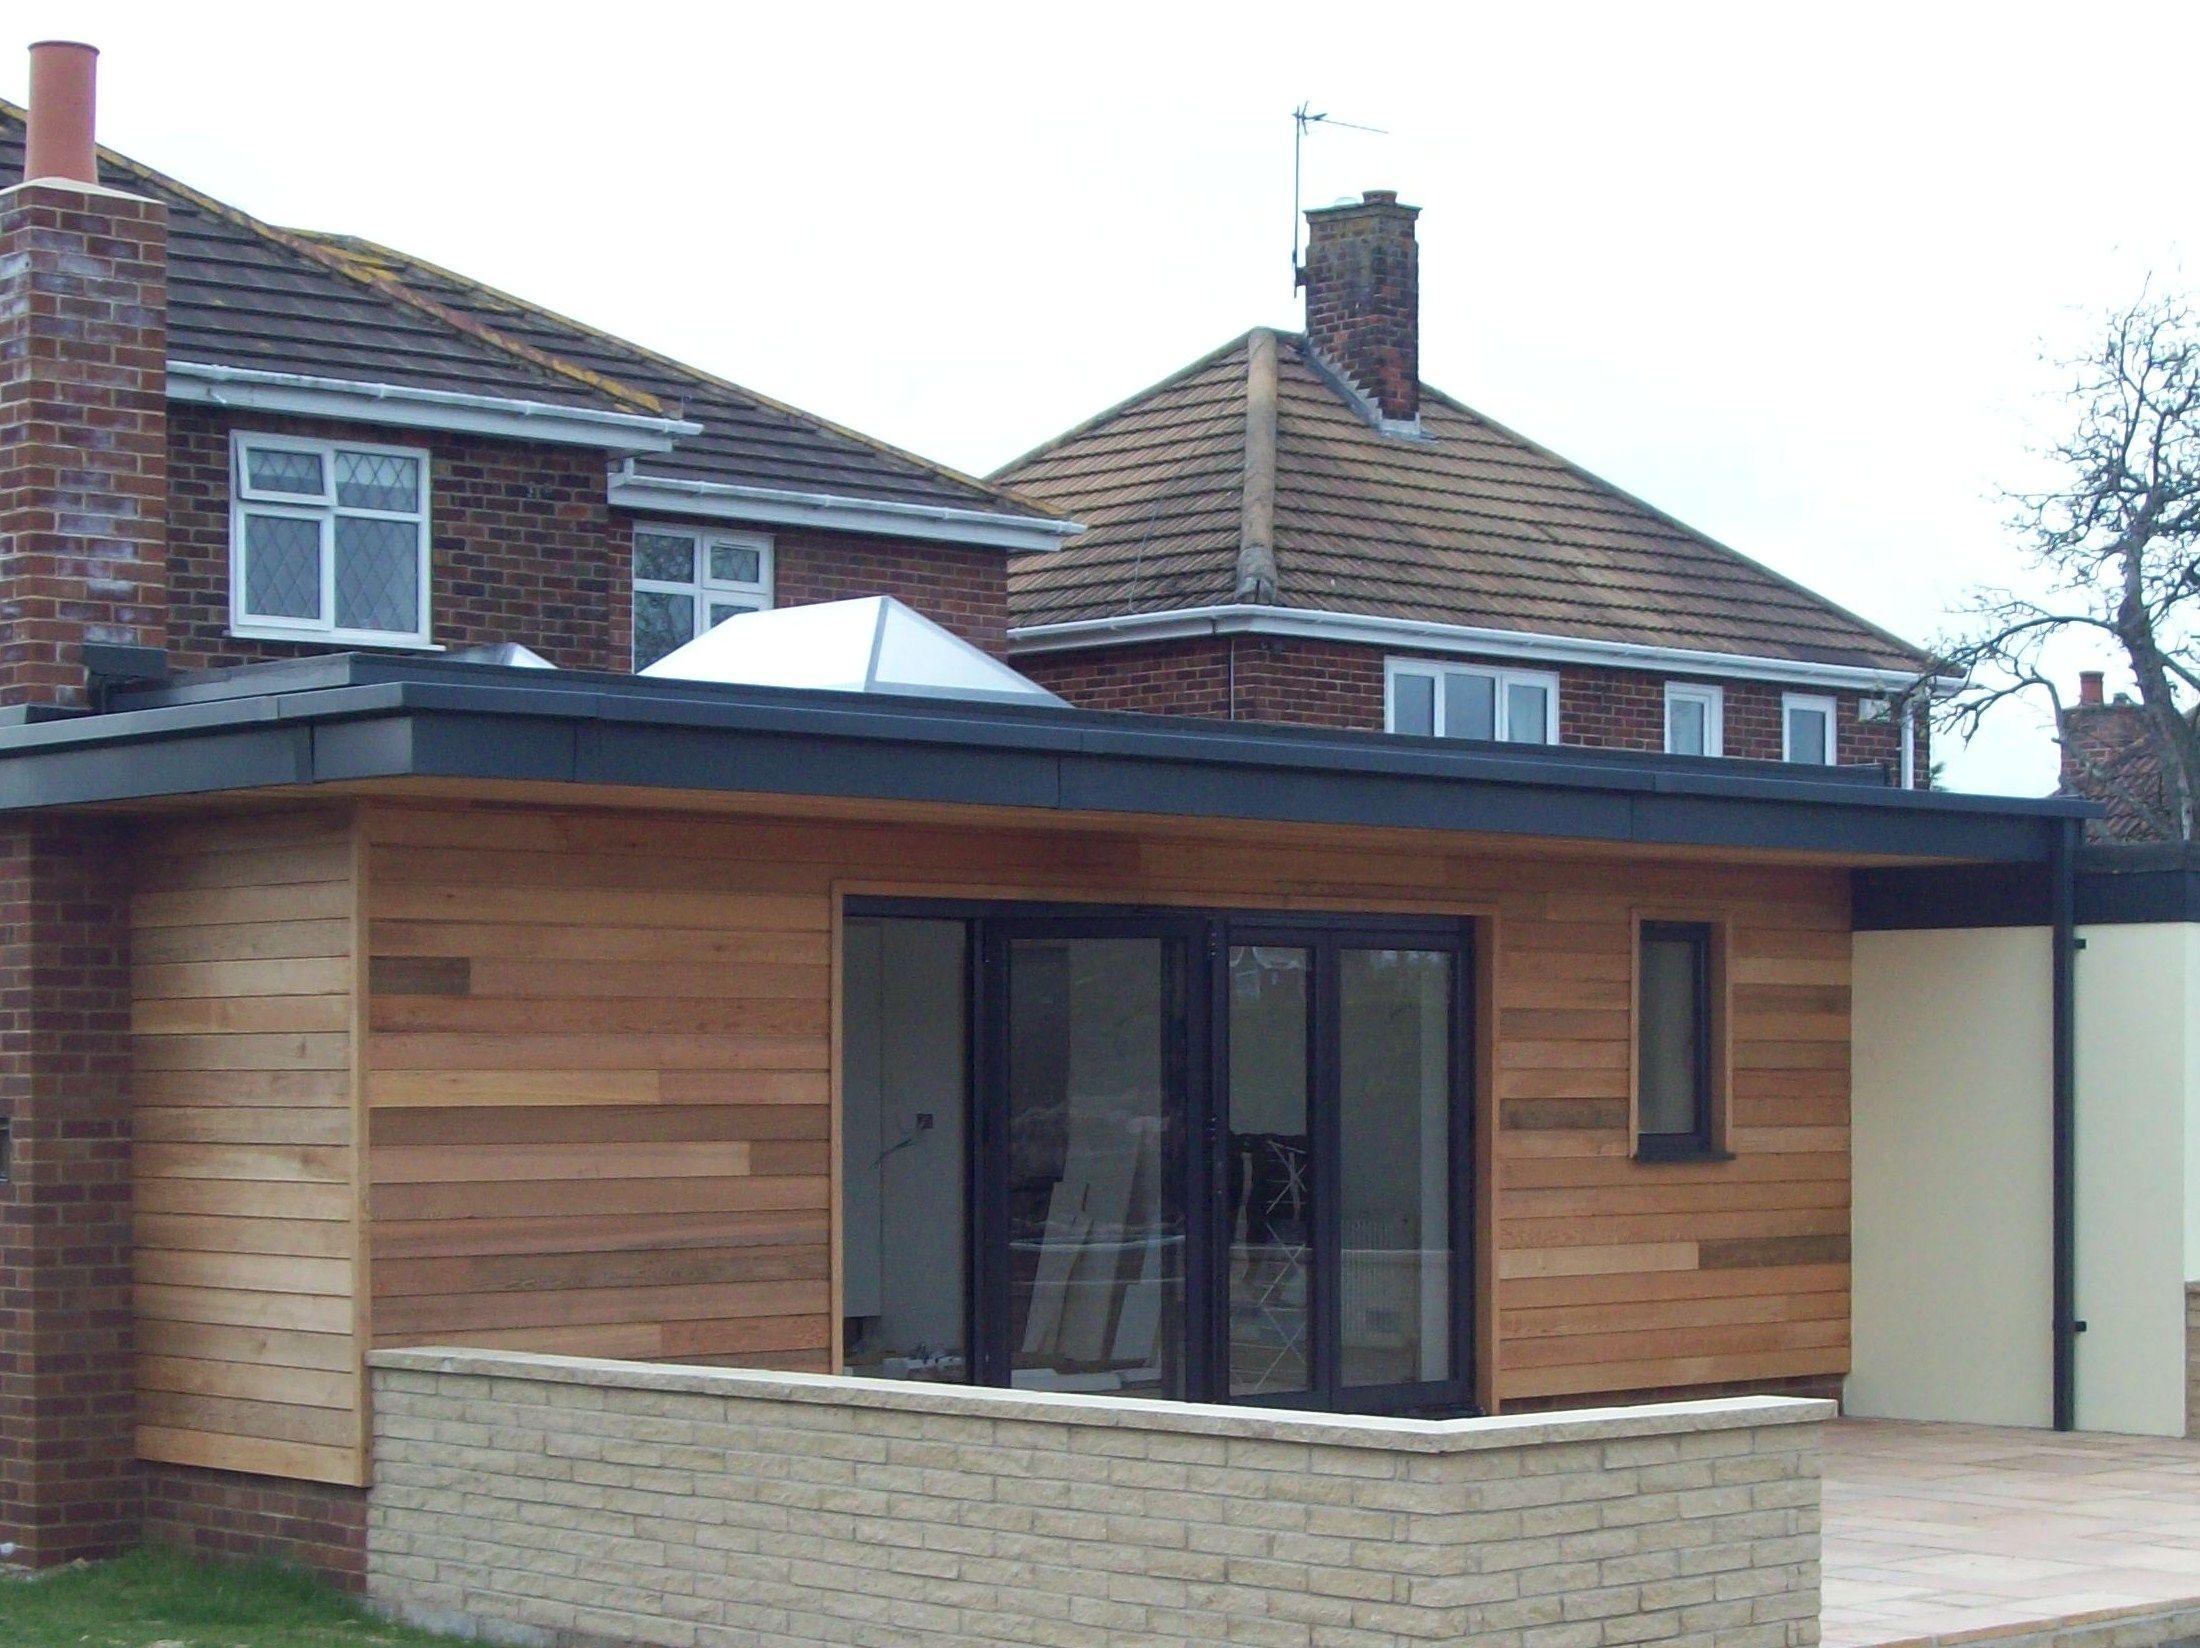 Cladding backyard fun pinterest extension google for Porch extension